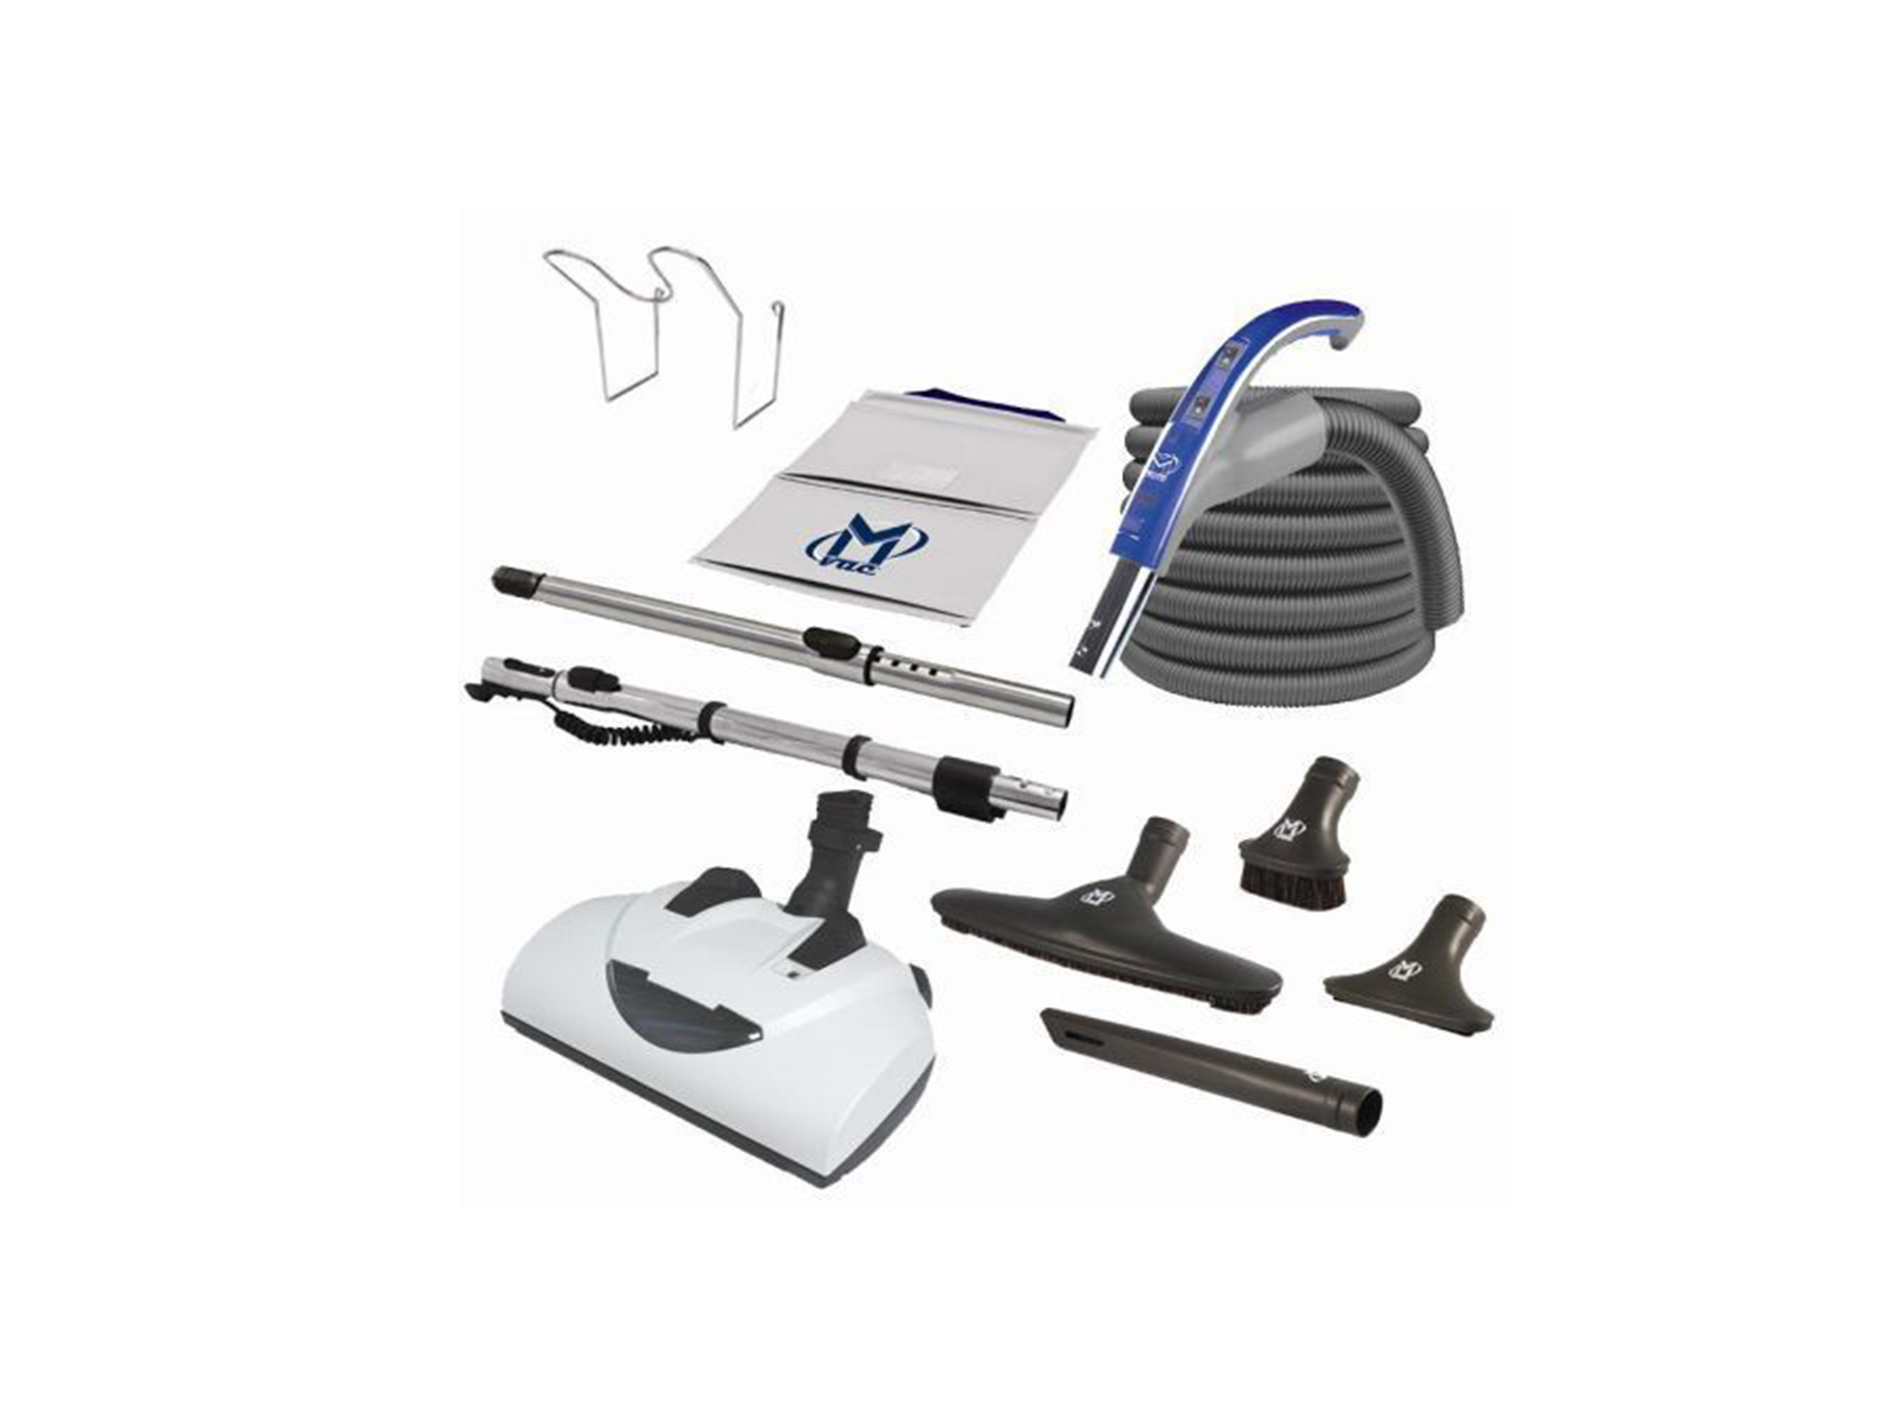 Mvac Premium Carpet And Bare Floor Cleaning Kit Cardy Vacuum